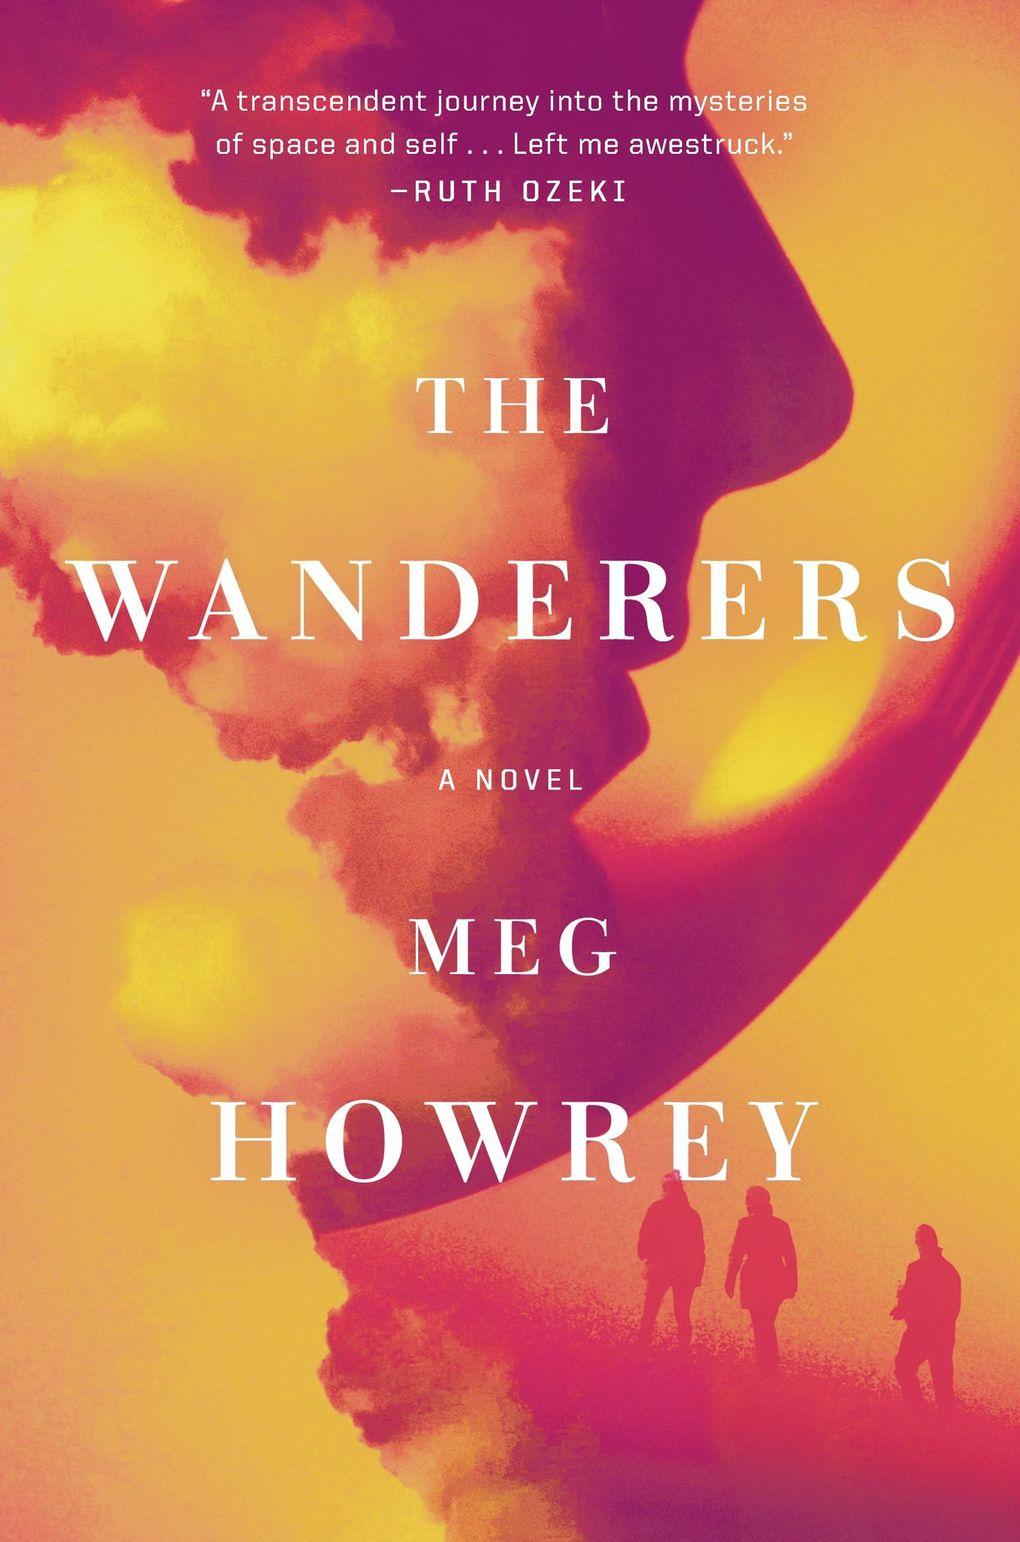 """The Wanderers"" by Meg Howrey (Penguin Random House)"